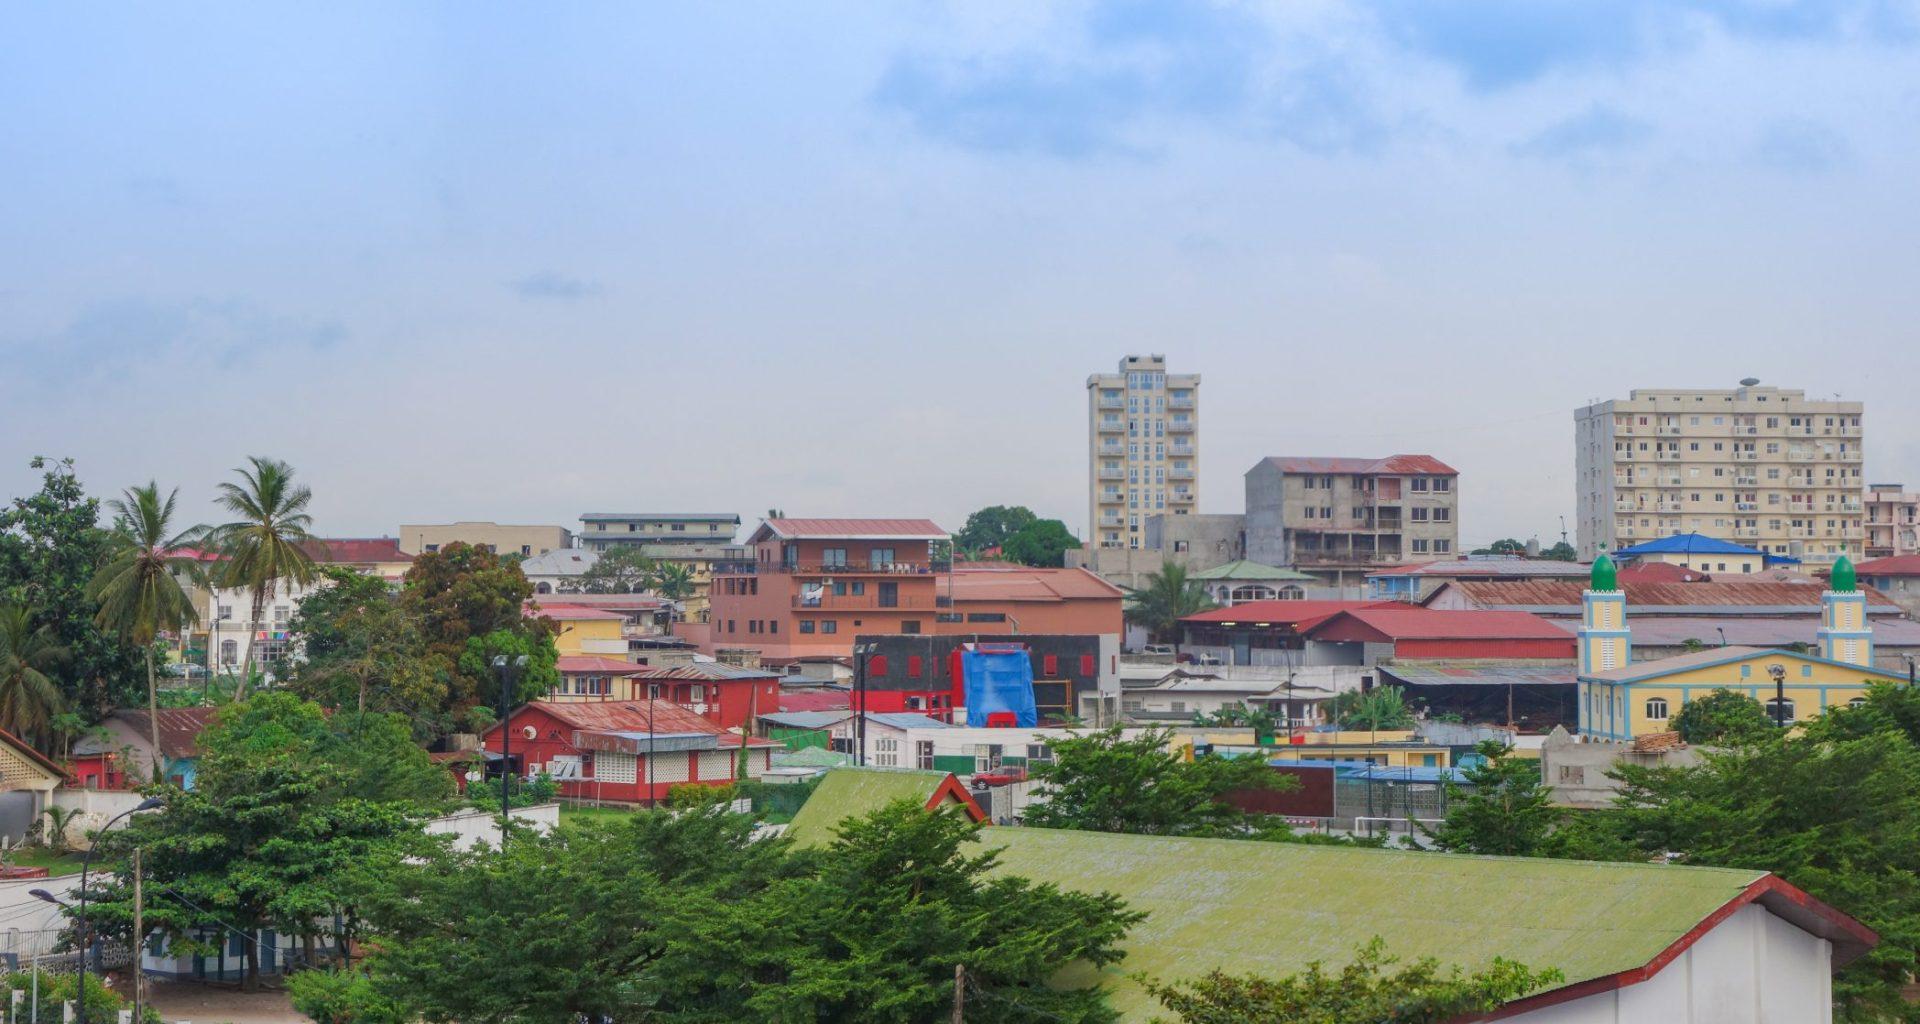 Bata in Equatorial Guinea